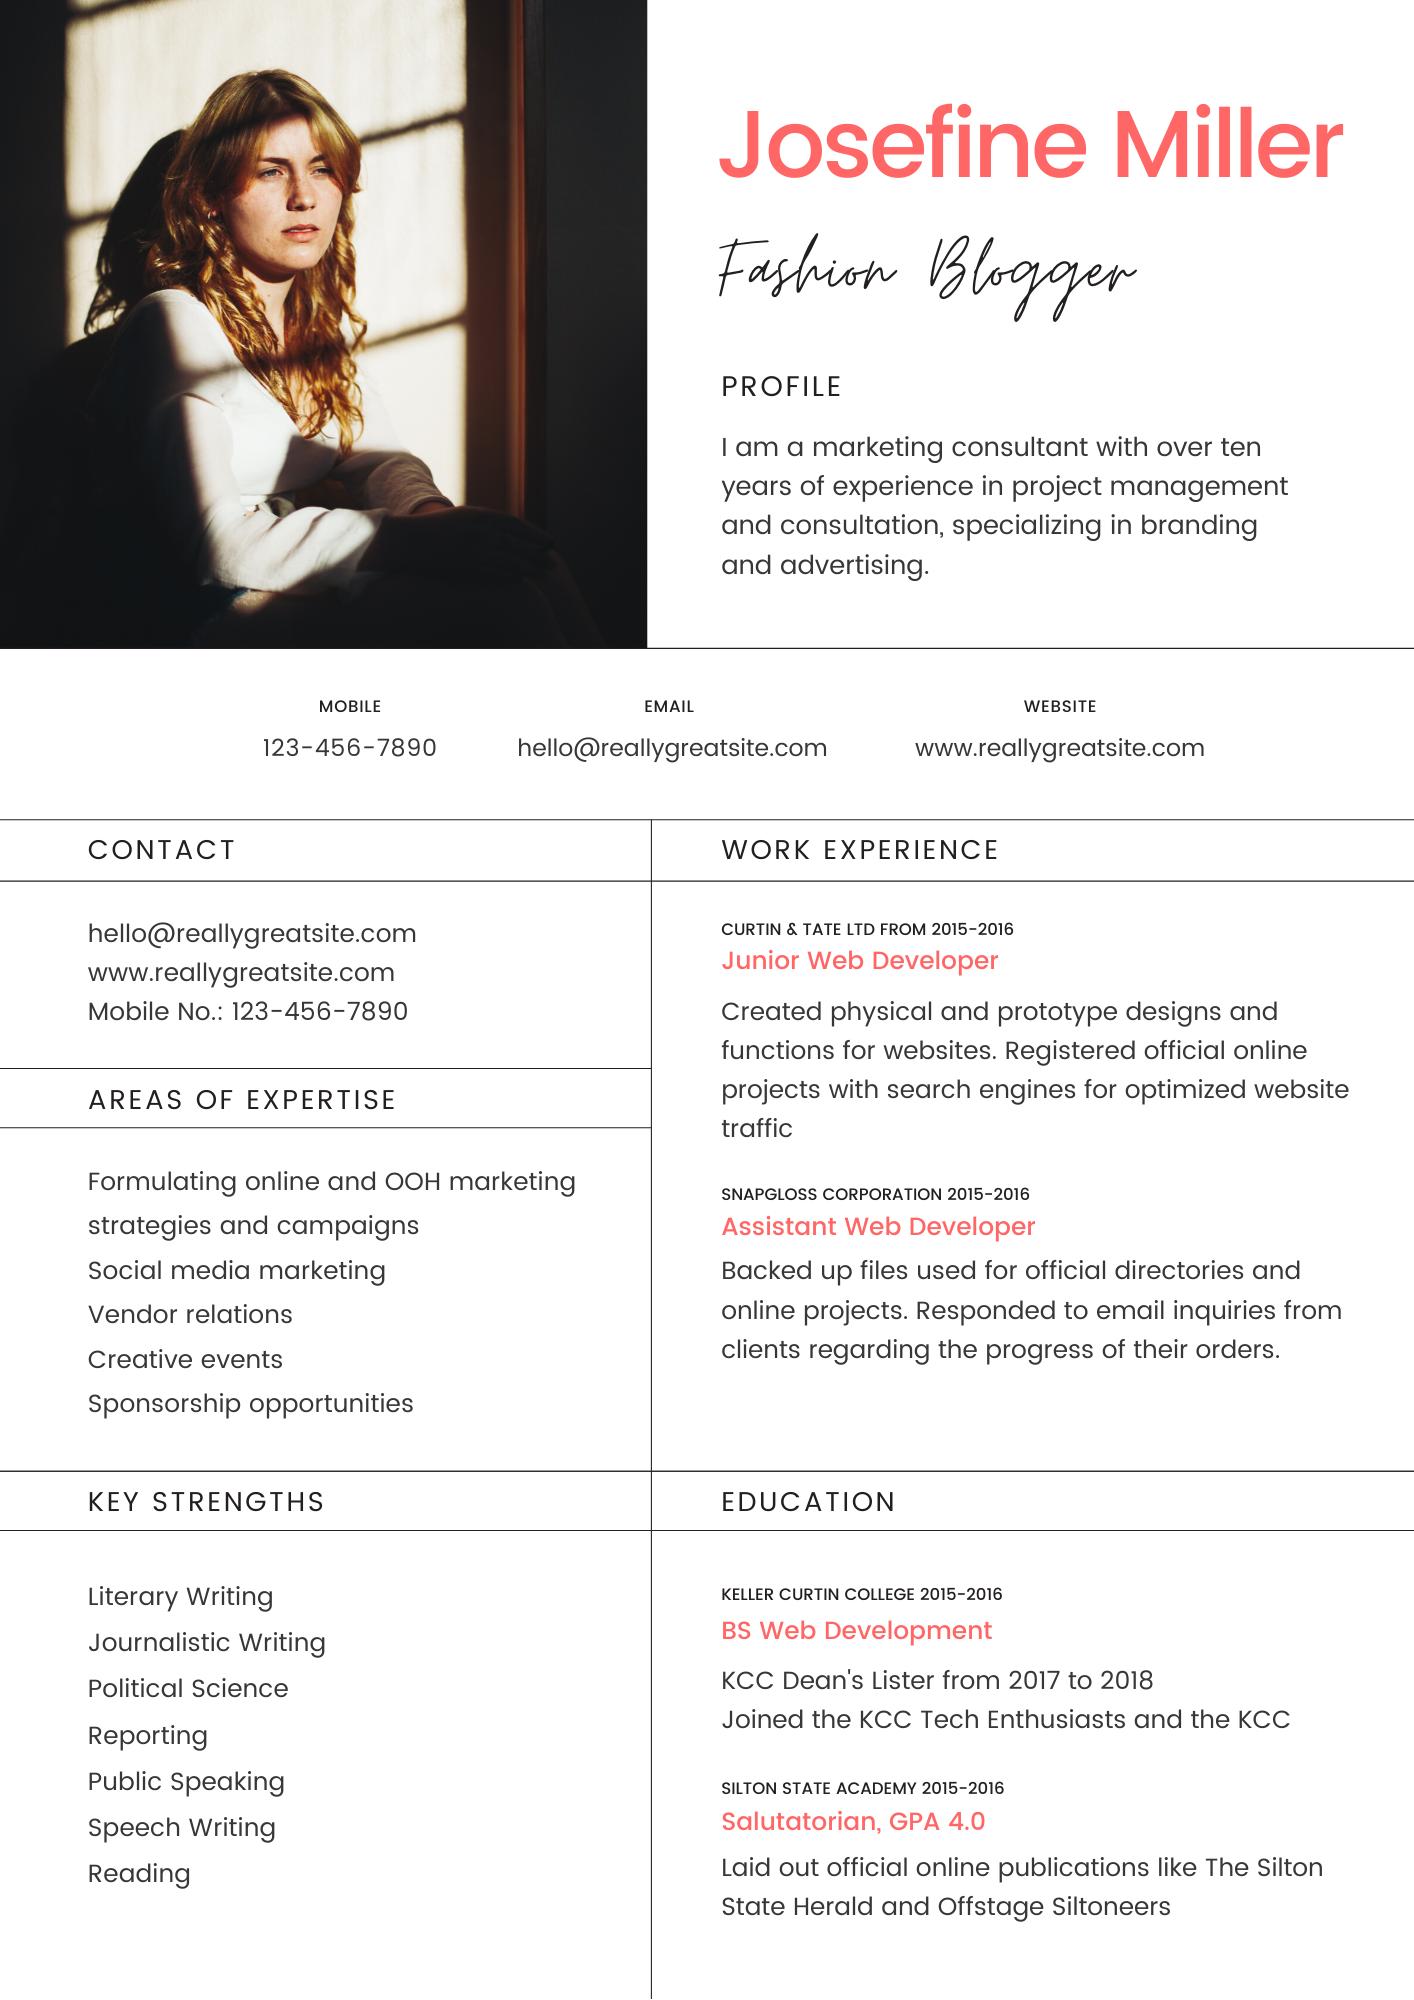 Peach and Black Modern Resume